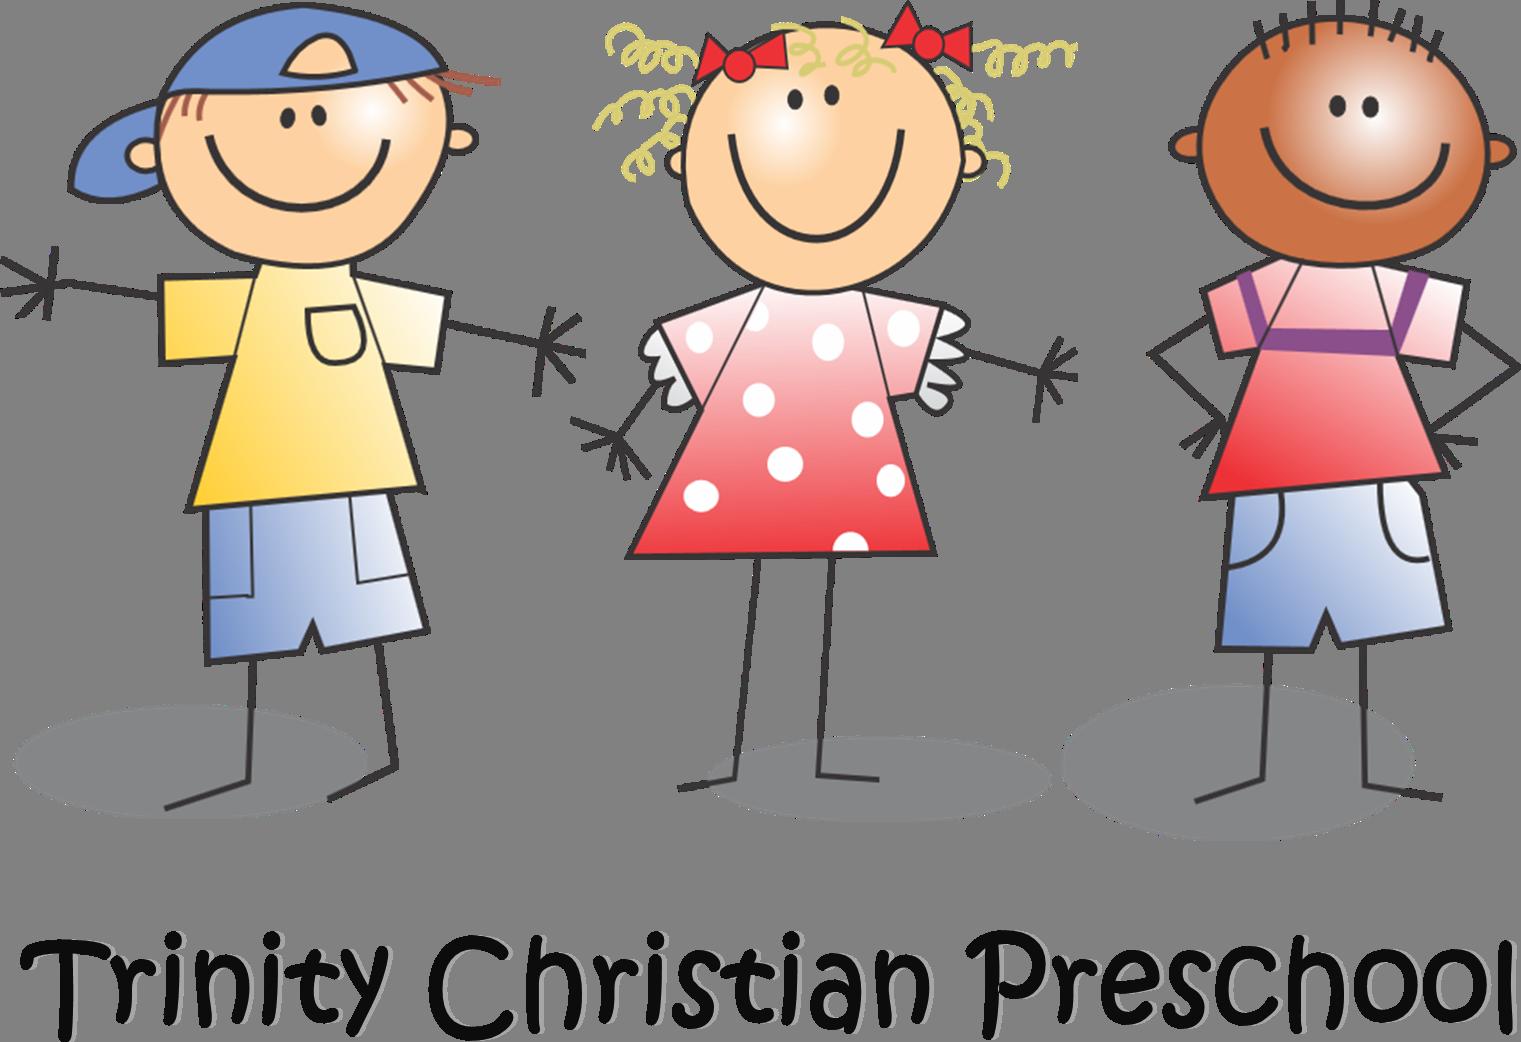 Preschool open house clipart clip art Dear Prospective Preschool Parents | Trinity Christian School clip art